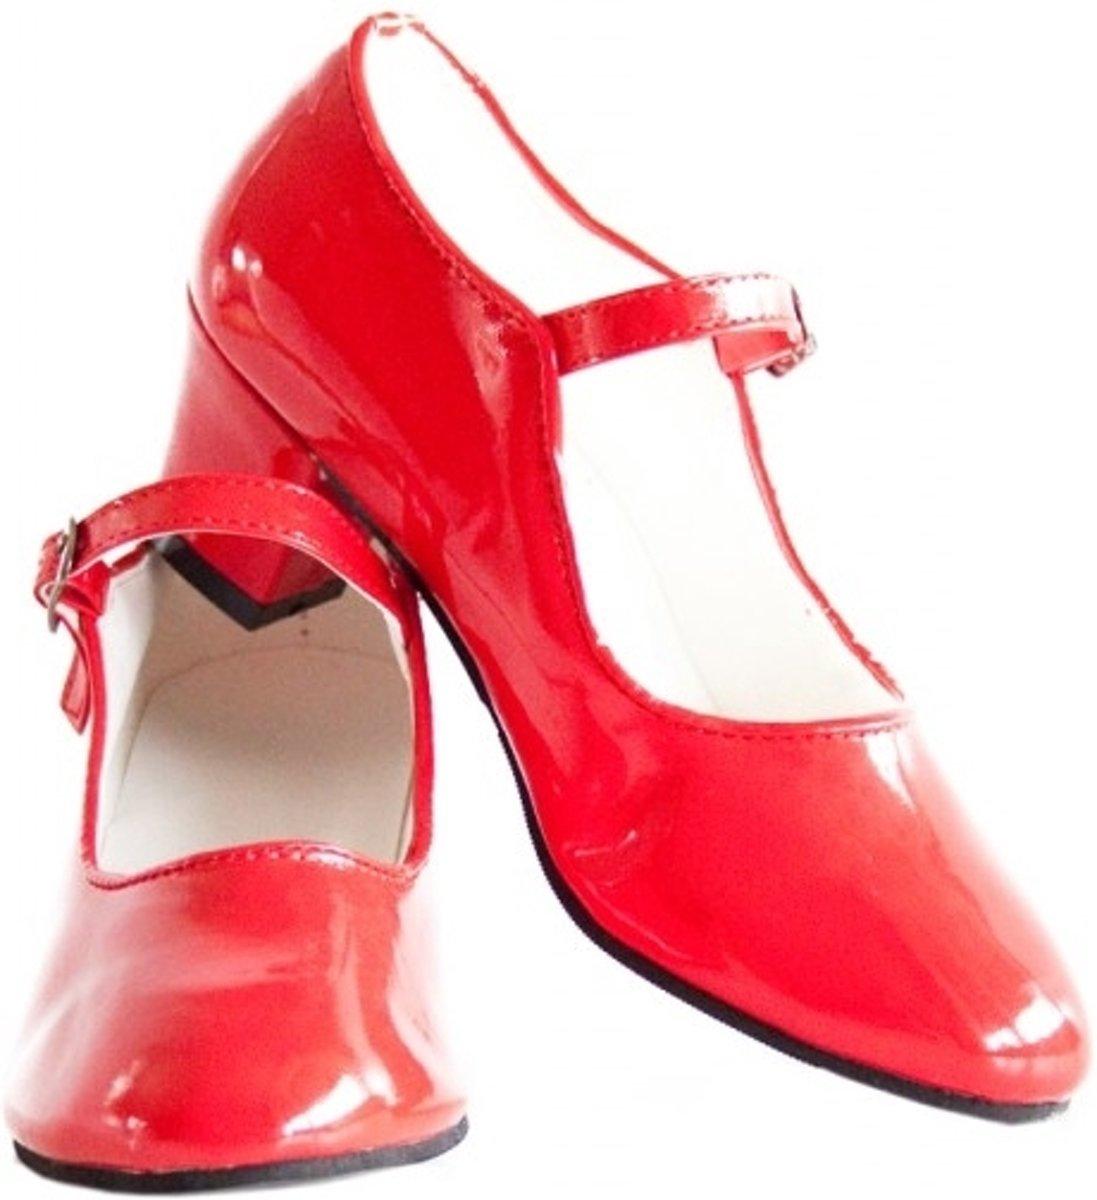 Spaanse Prinsessen Schoenen Rood Lak Maat 26 Binnenmaat 18 Cm